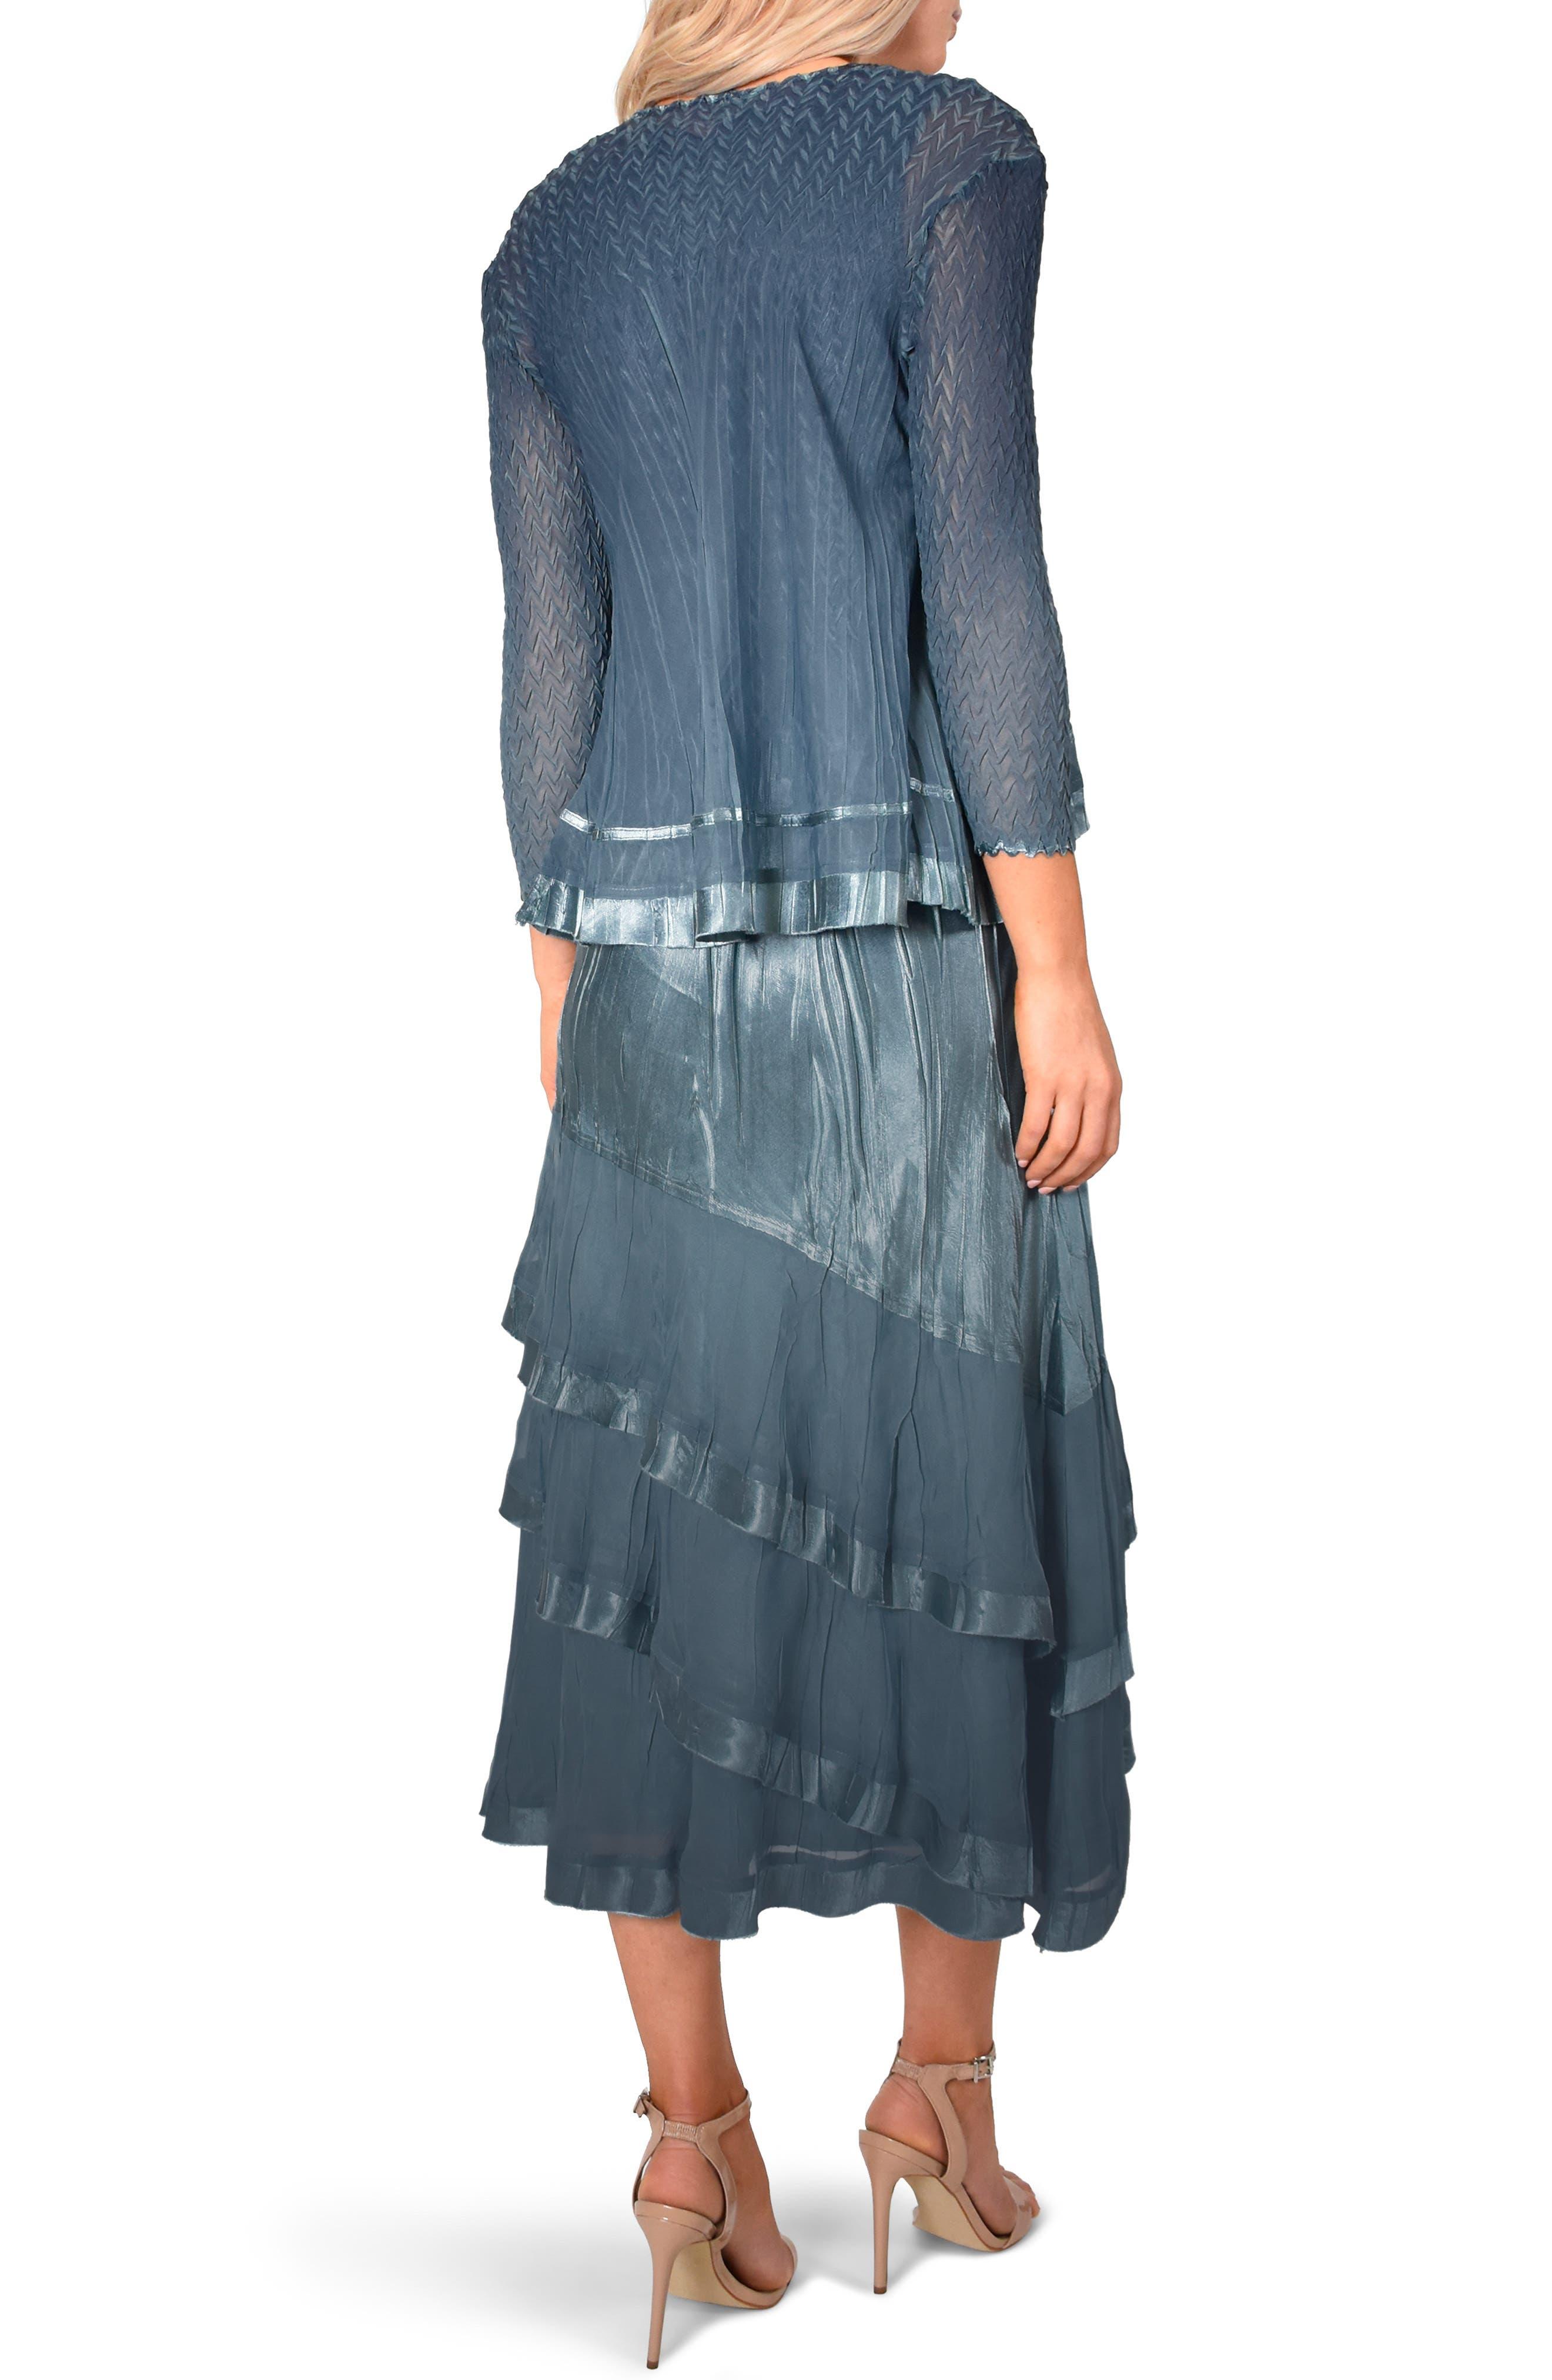 KOMAROV, Asymmetrical Jacket Dress, Alternate thumbnail 2, color, SILVER BLUE NIGHT OMBRE